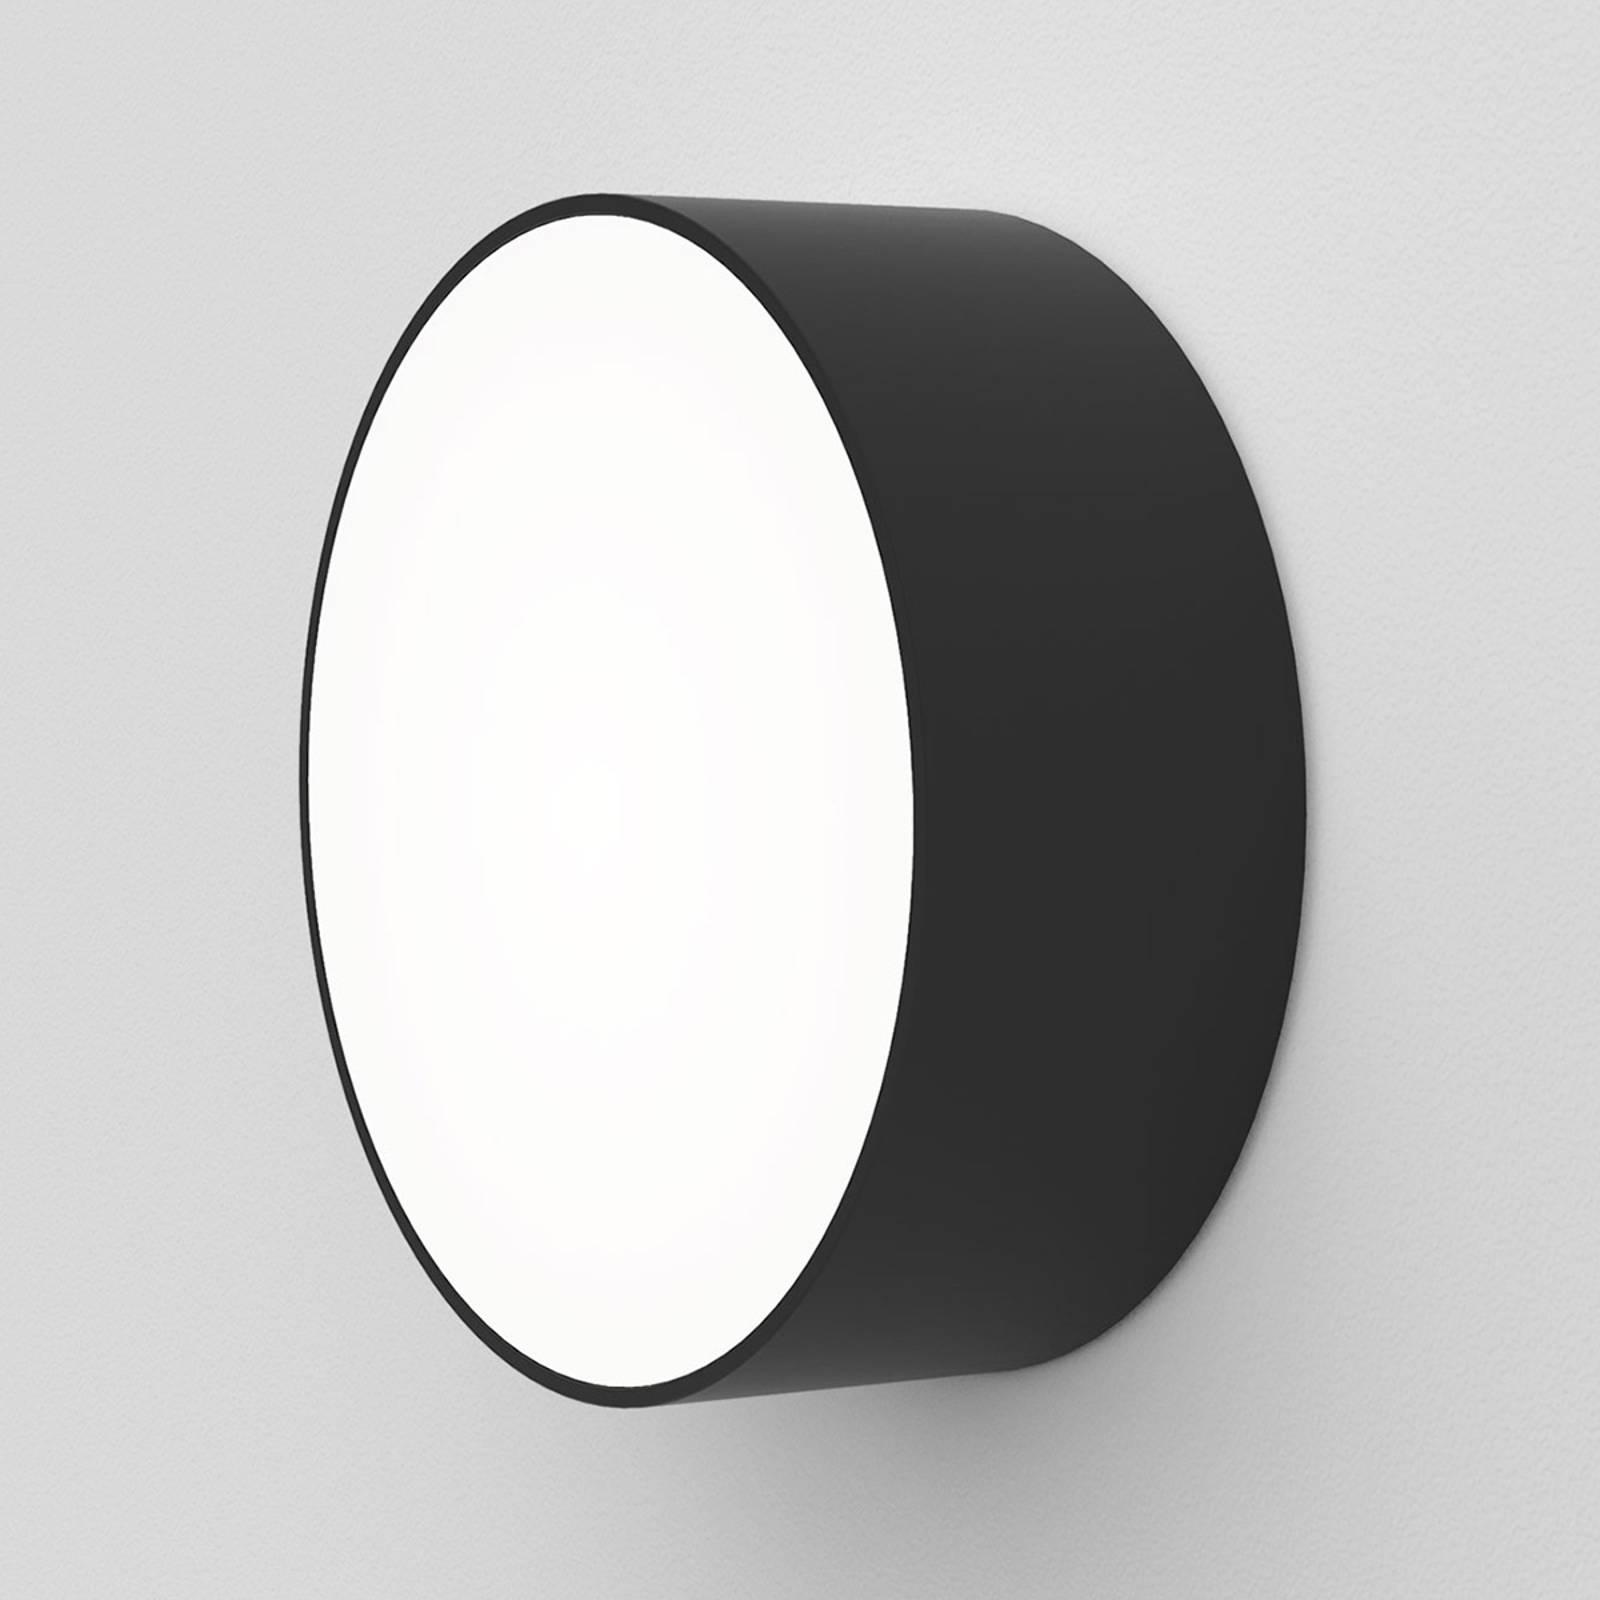 Astro Kea Round 150 LED-Wandleuchte schwarz